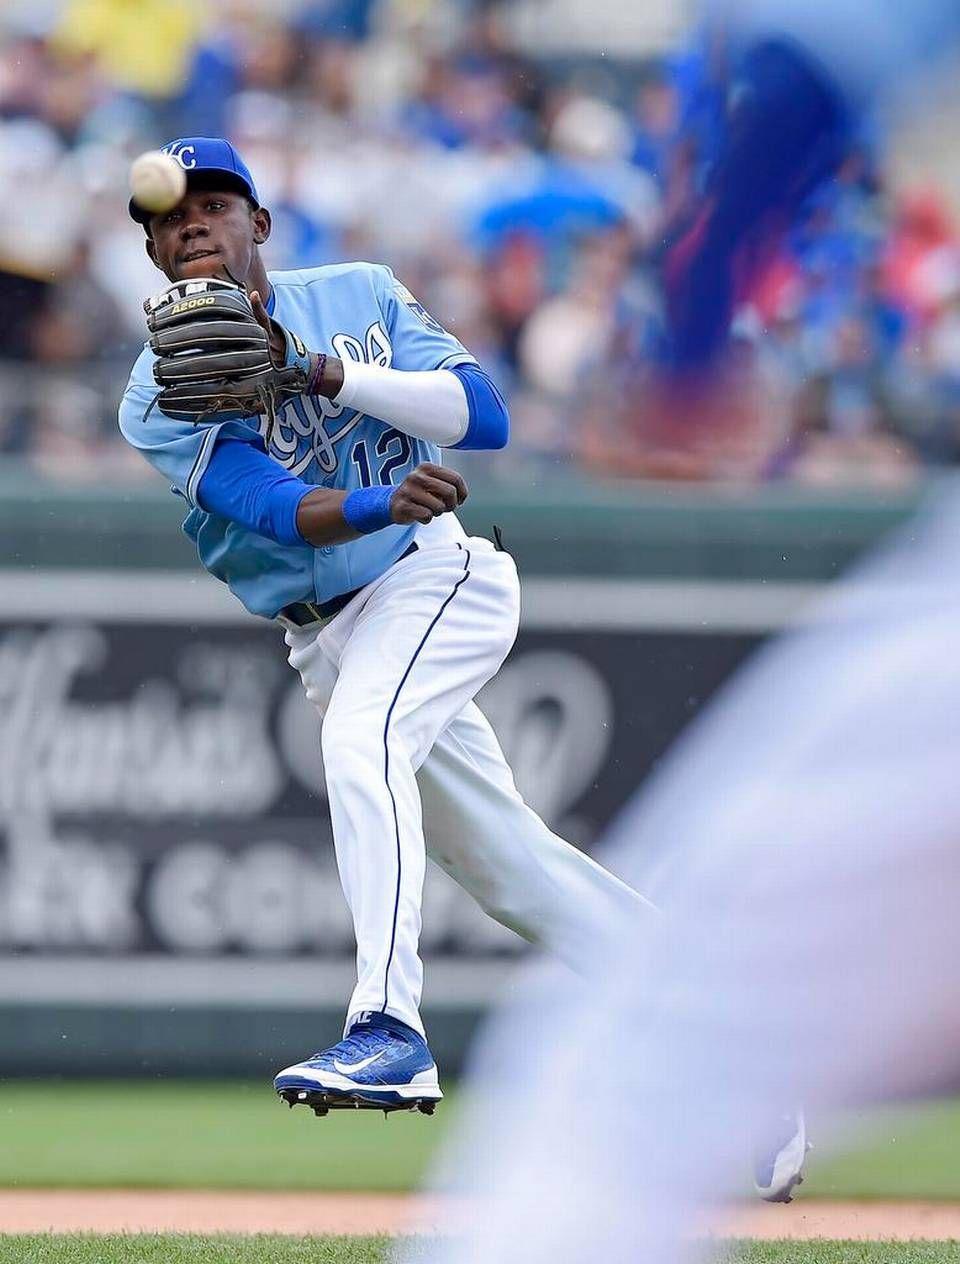 Kansas City Royals shortstop Orlando Calixte (12) fields a